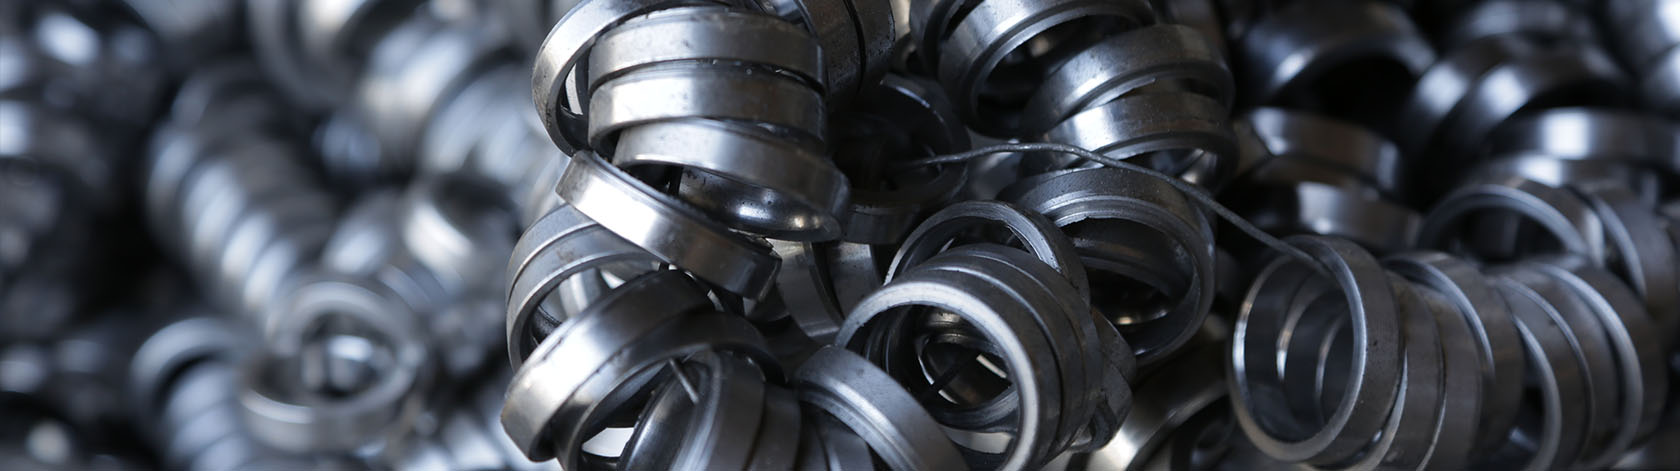 heat-treatment-of-cast-irons